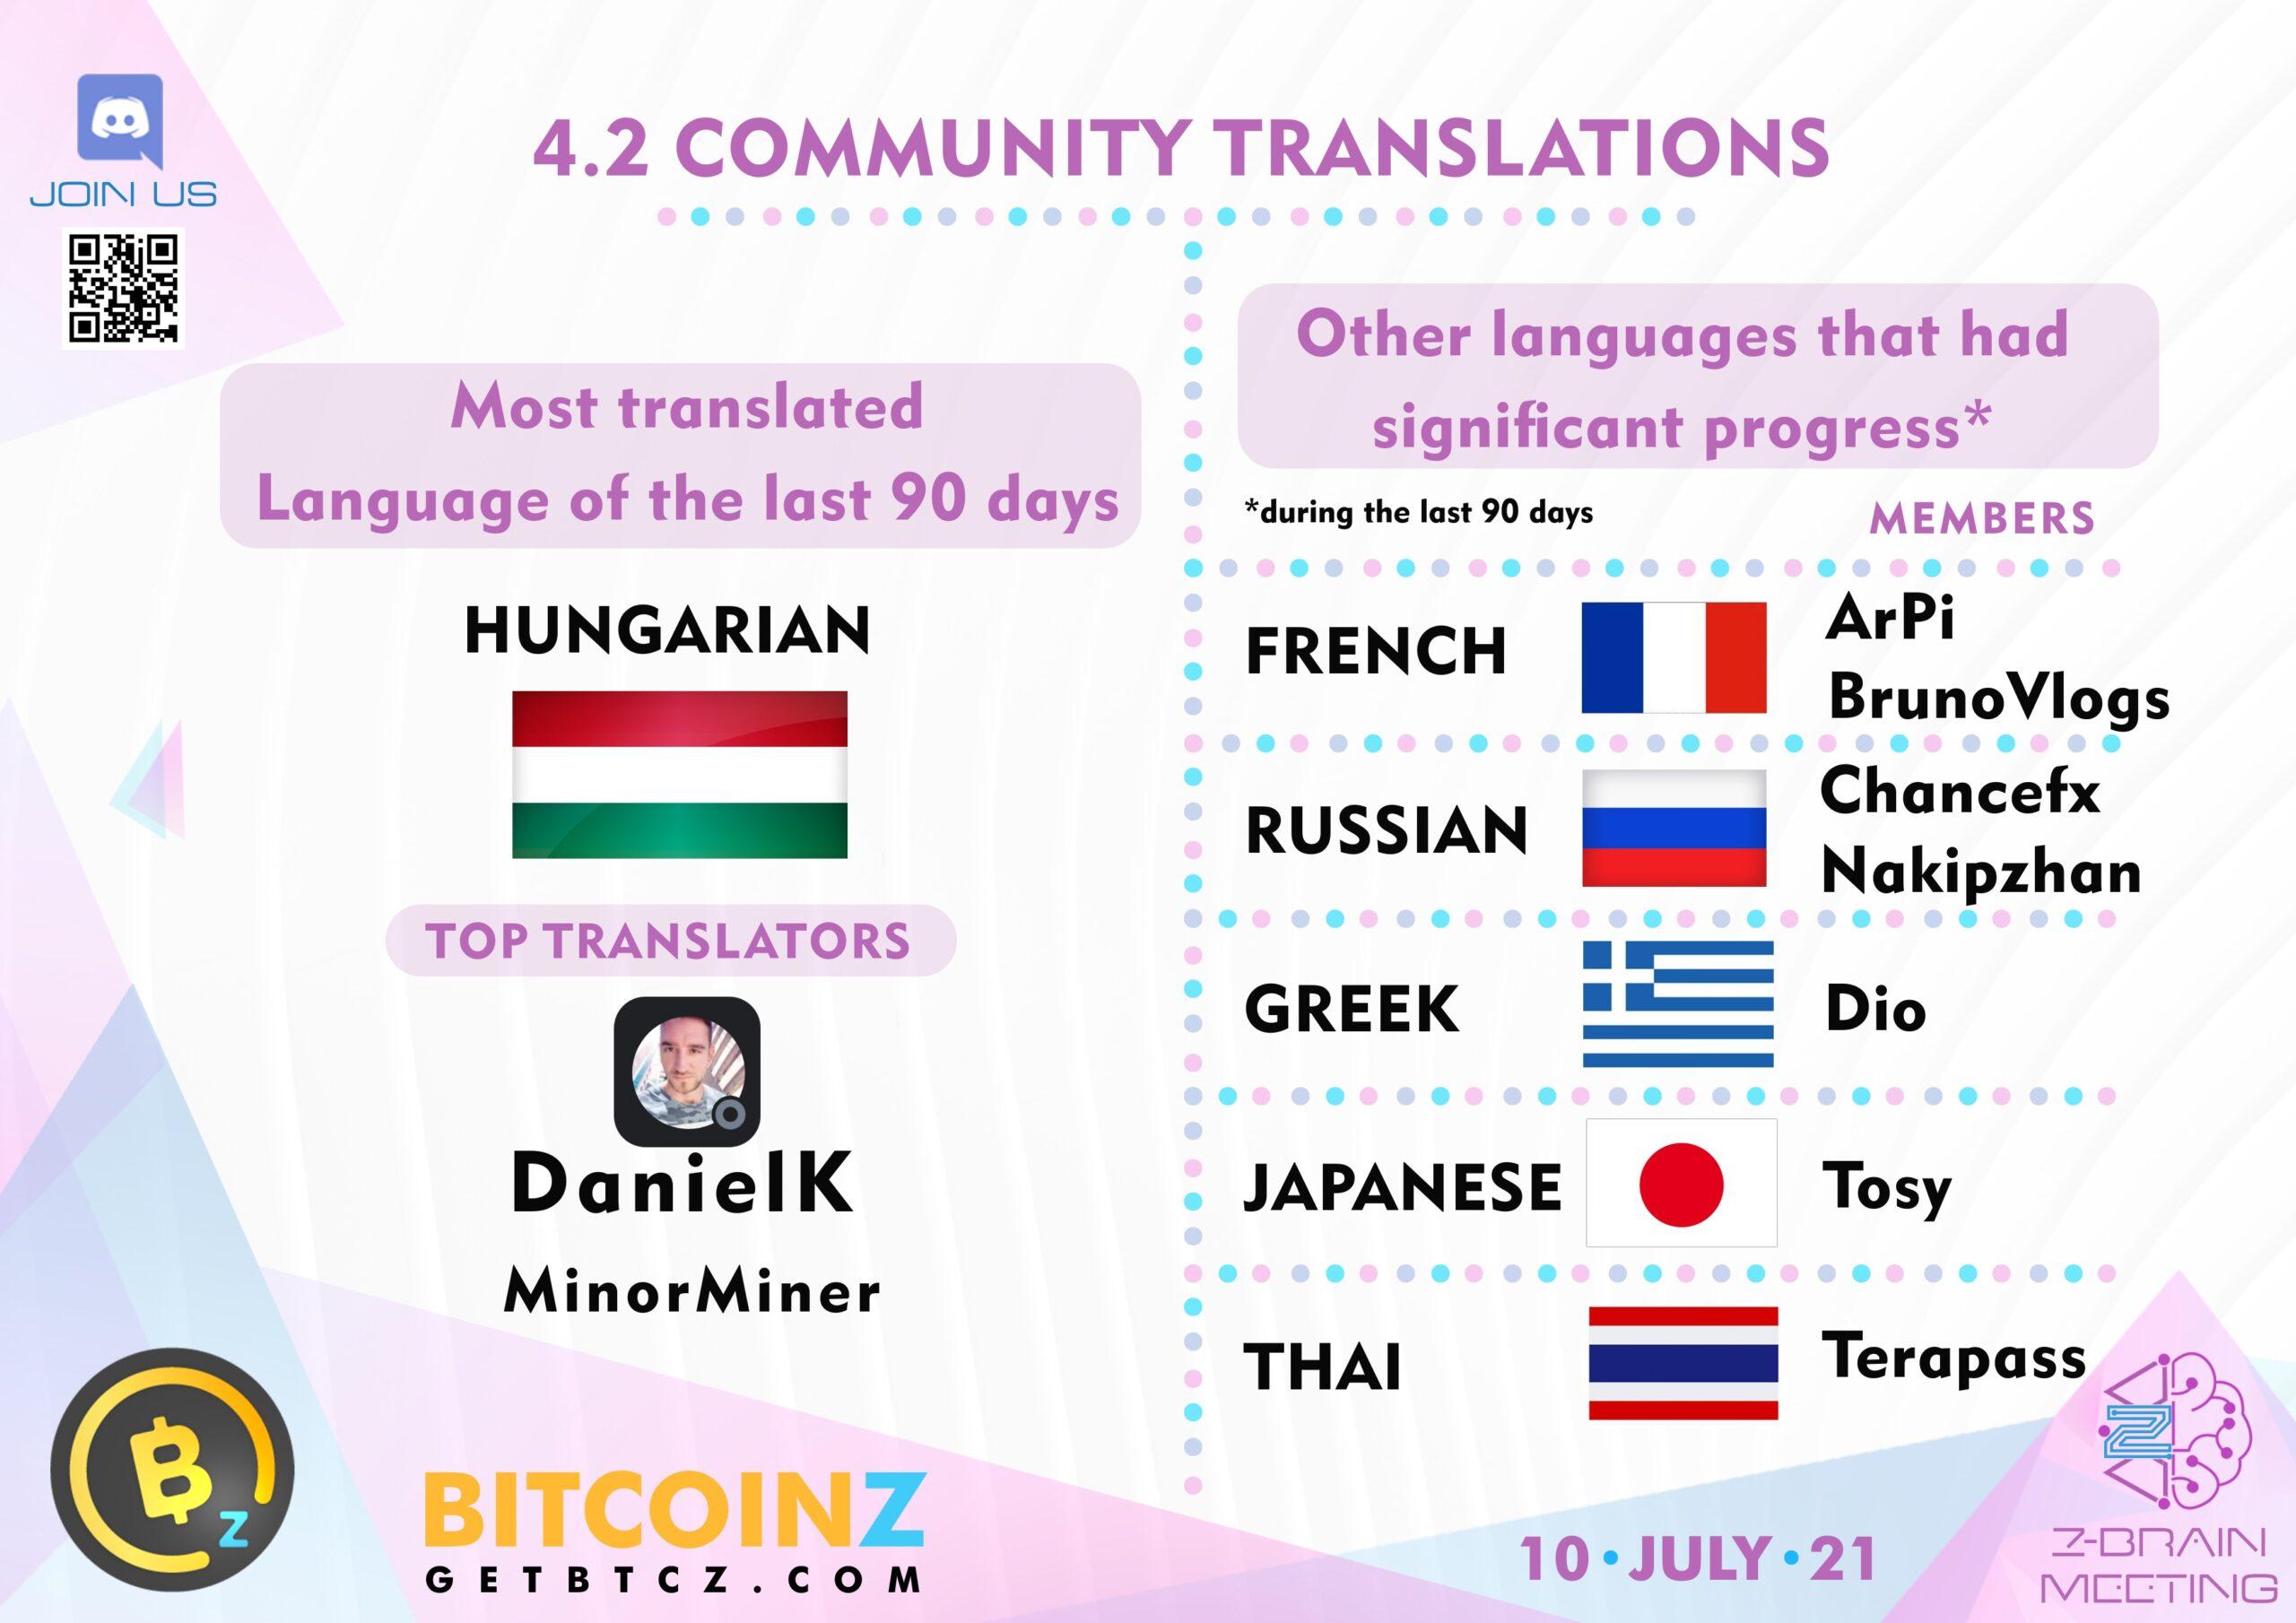 Top translators BITCOINZ